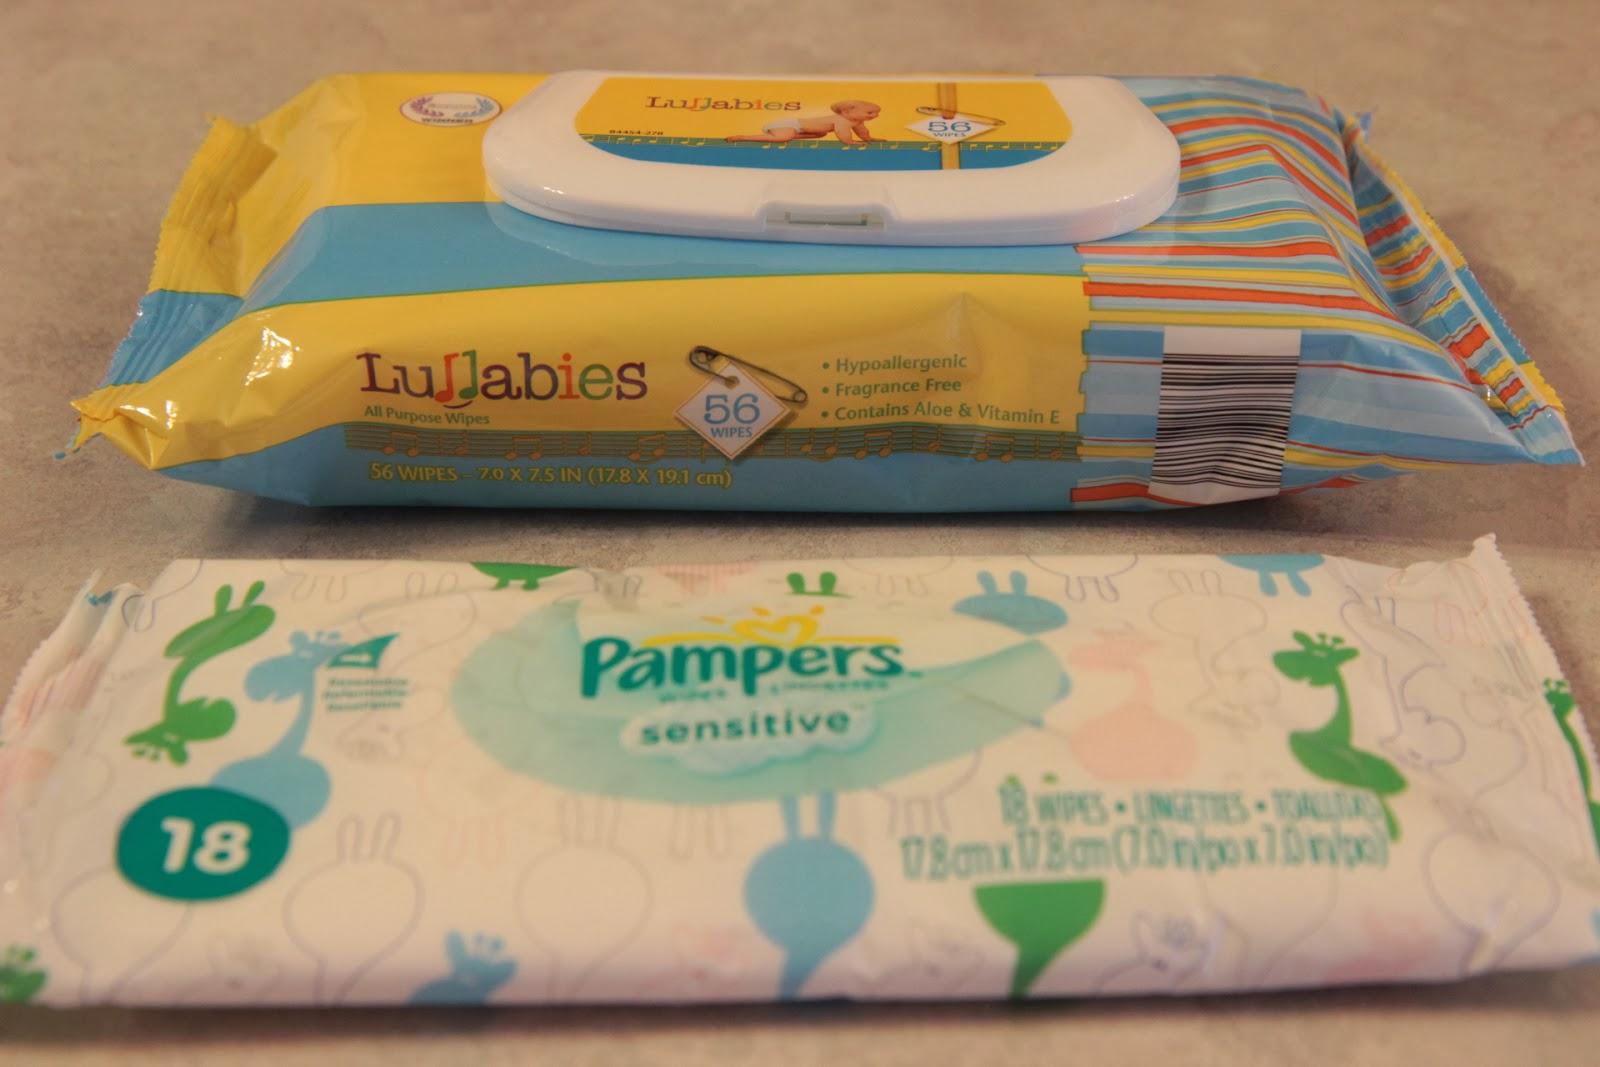 Aldi Lullabies vs Pampers Sensitive